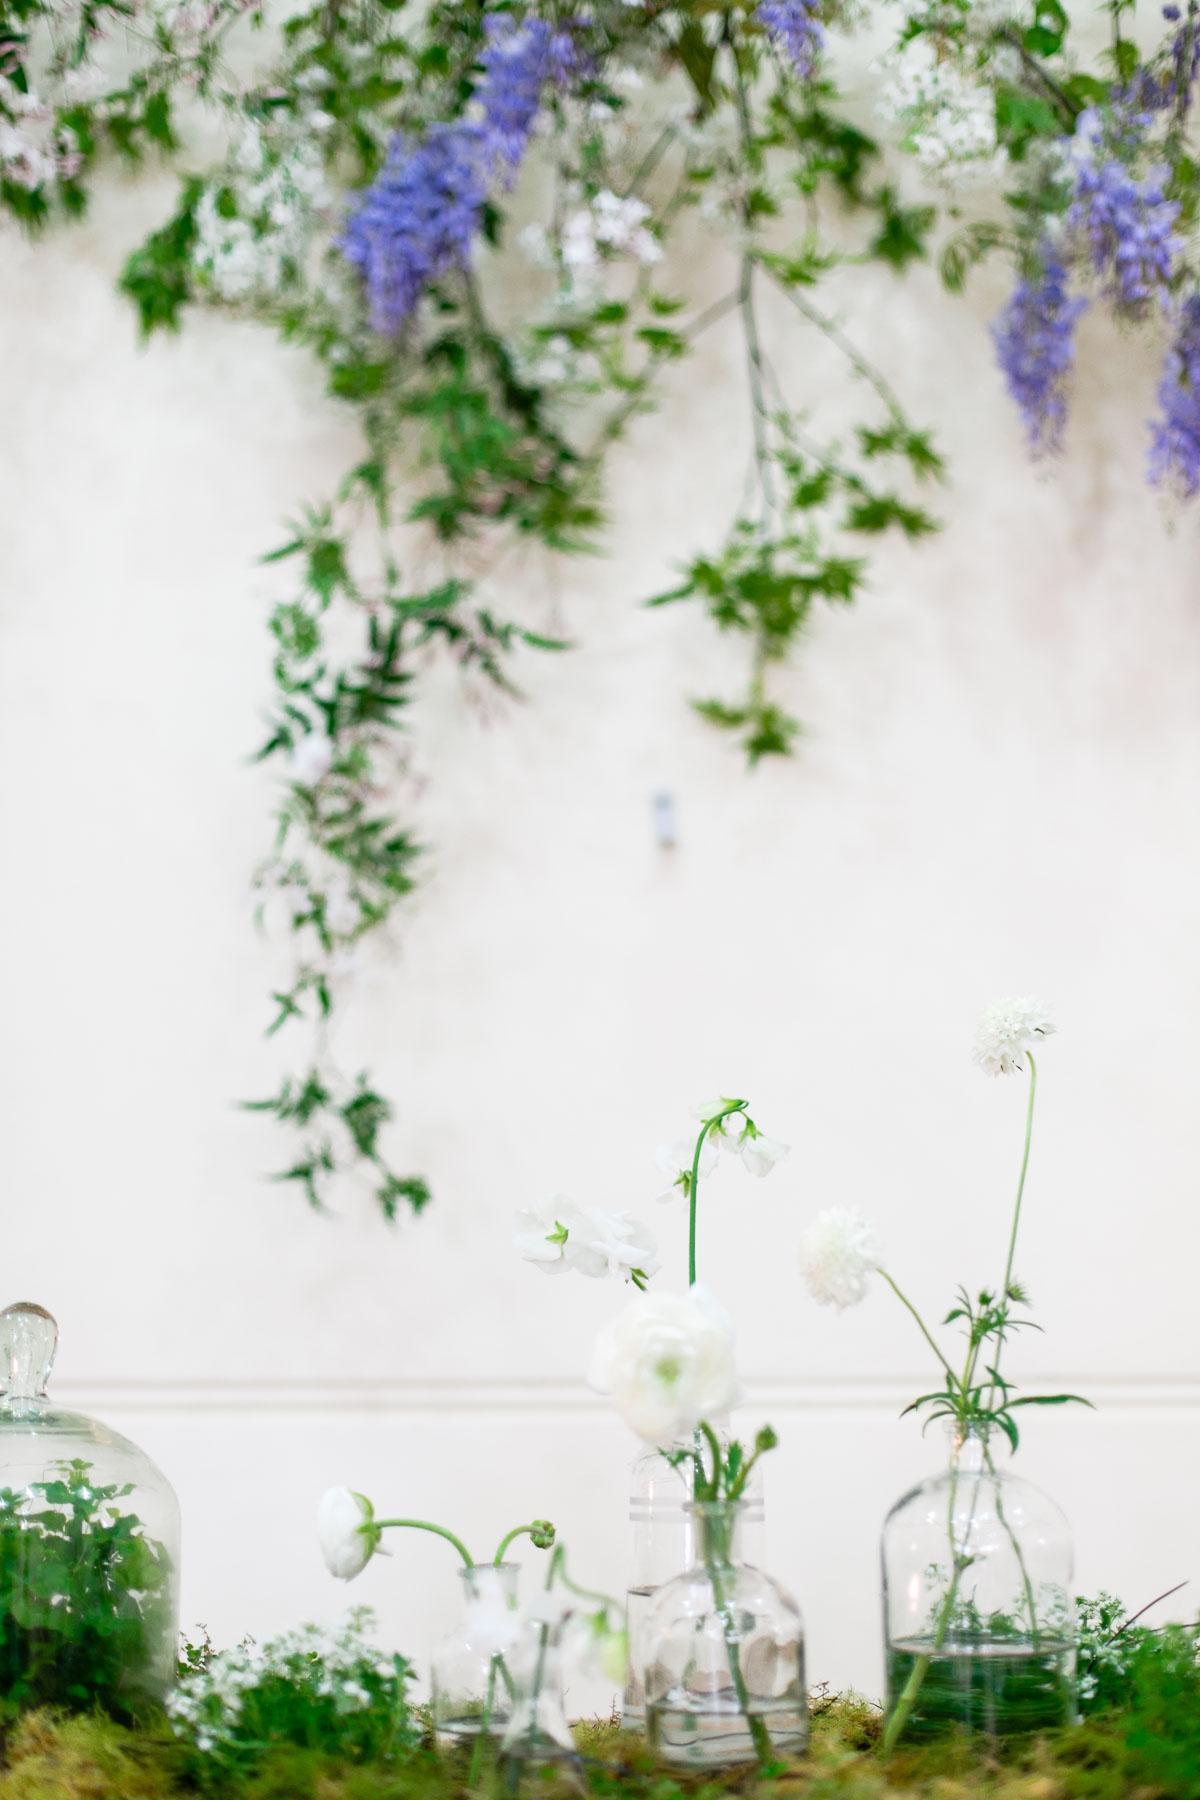 20141005-PYHII-DIY WEDDING-002.jpg